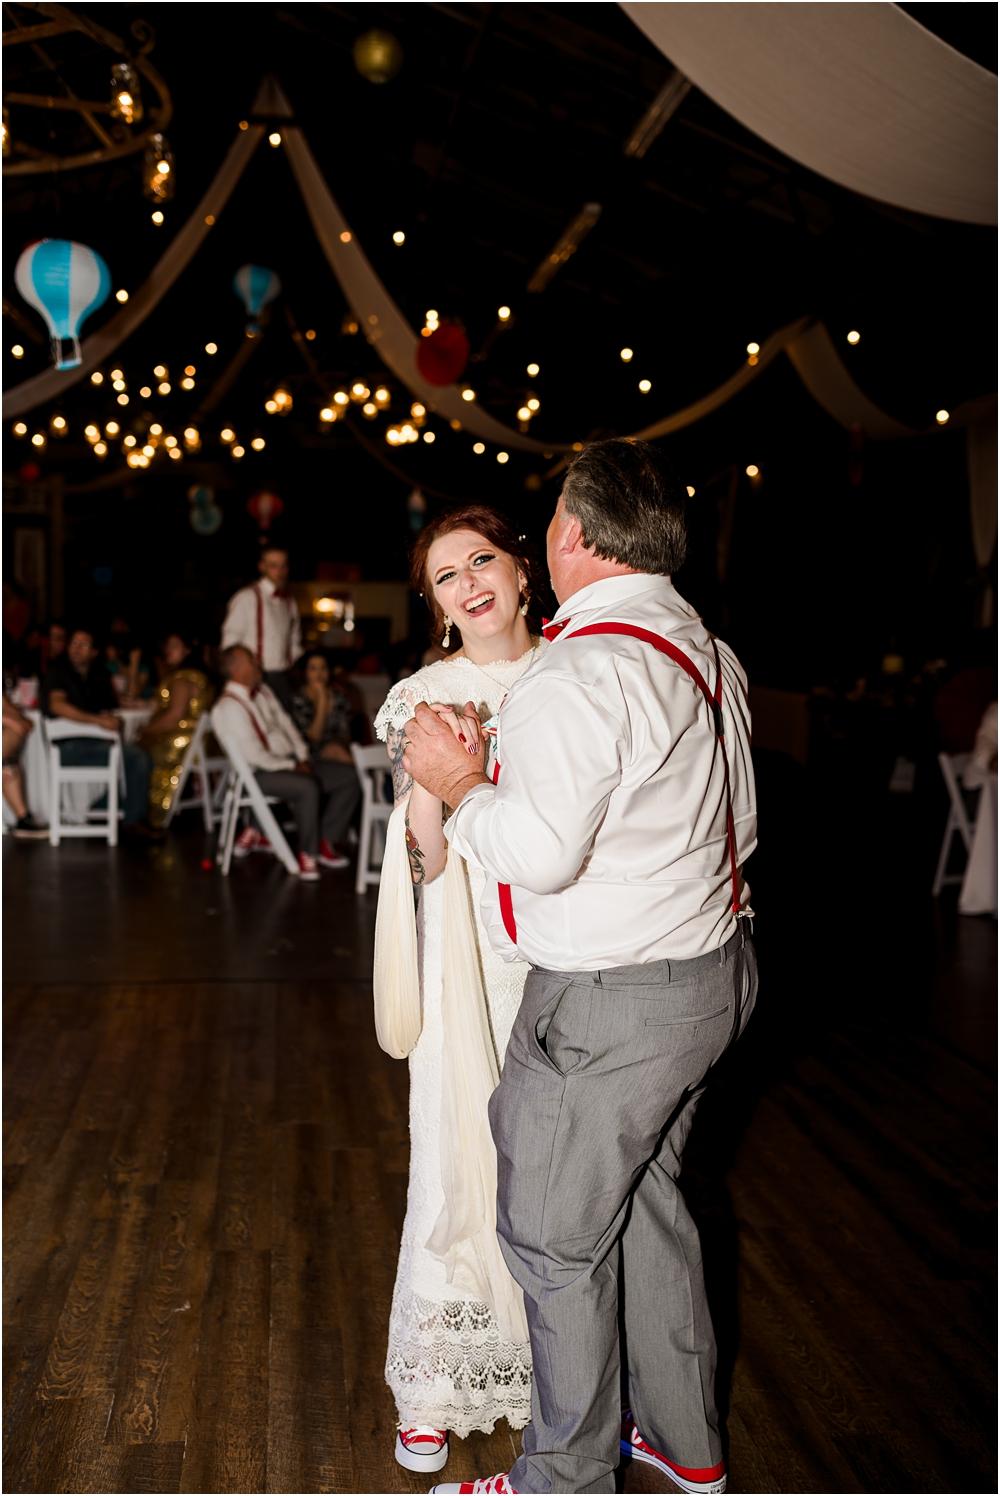 the-barn-at-wateroaks-circus-florida-wedding-photographer-kiersten-stevenson-photography-120.jpg